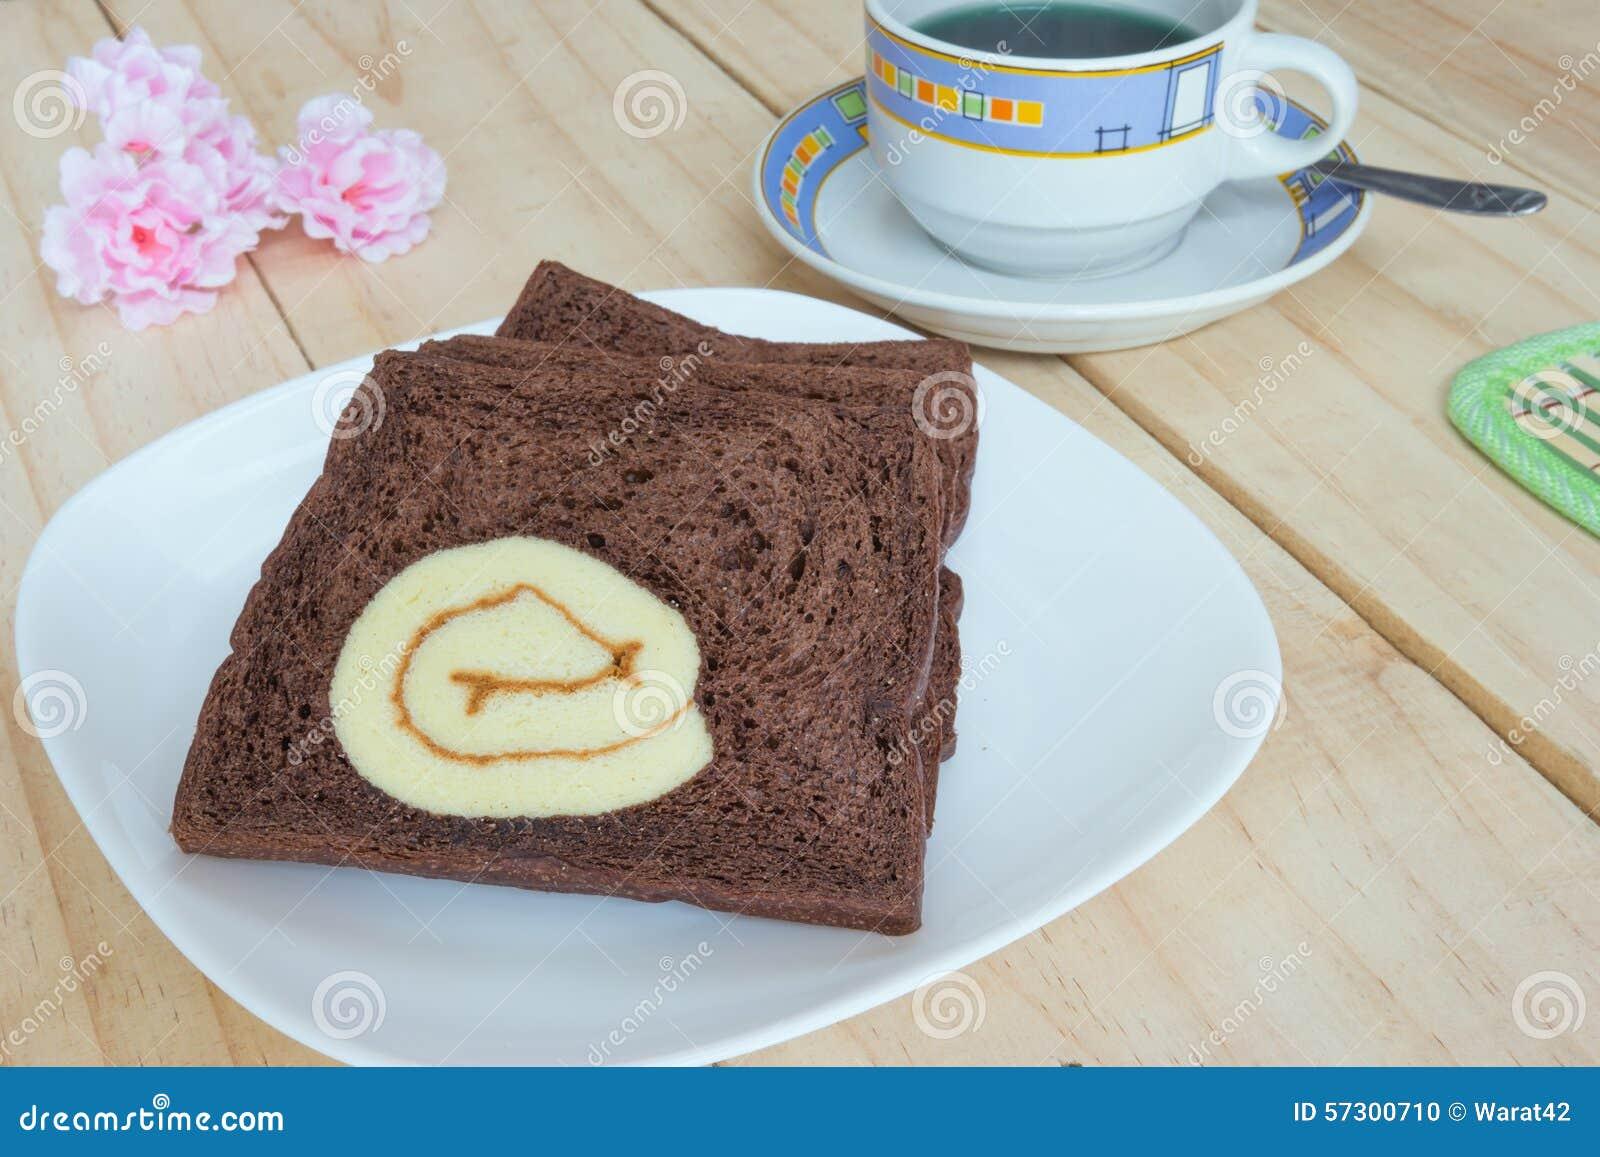 Cartoon Jelly Cake Recipe: Bread With Chocolate Stock Photography